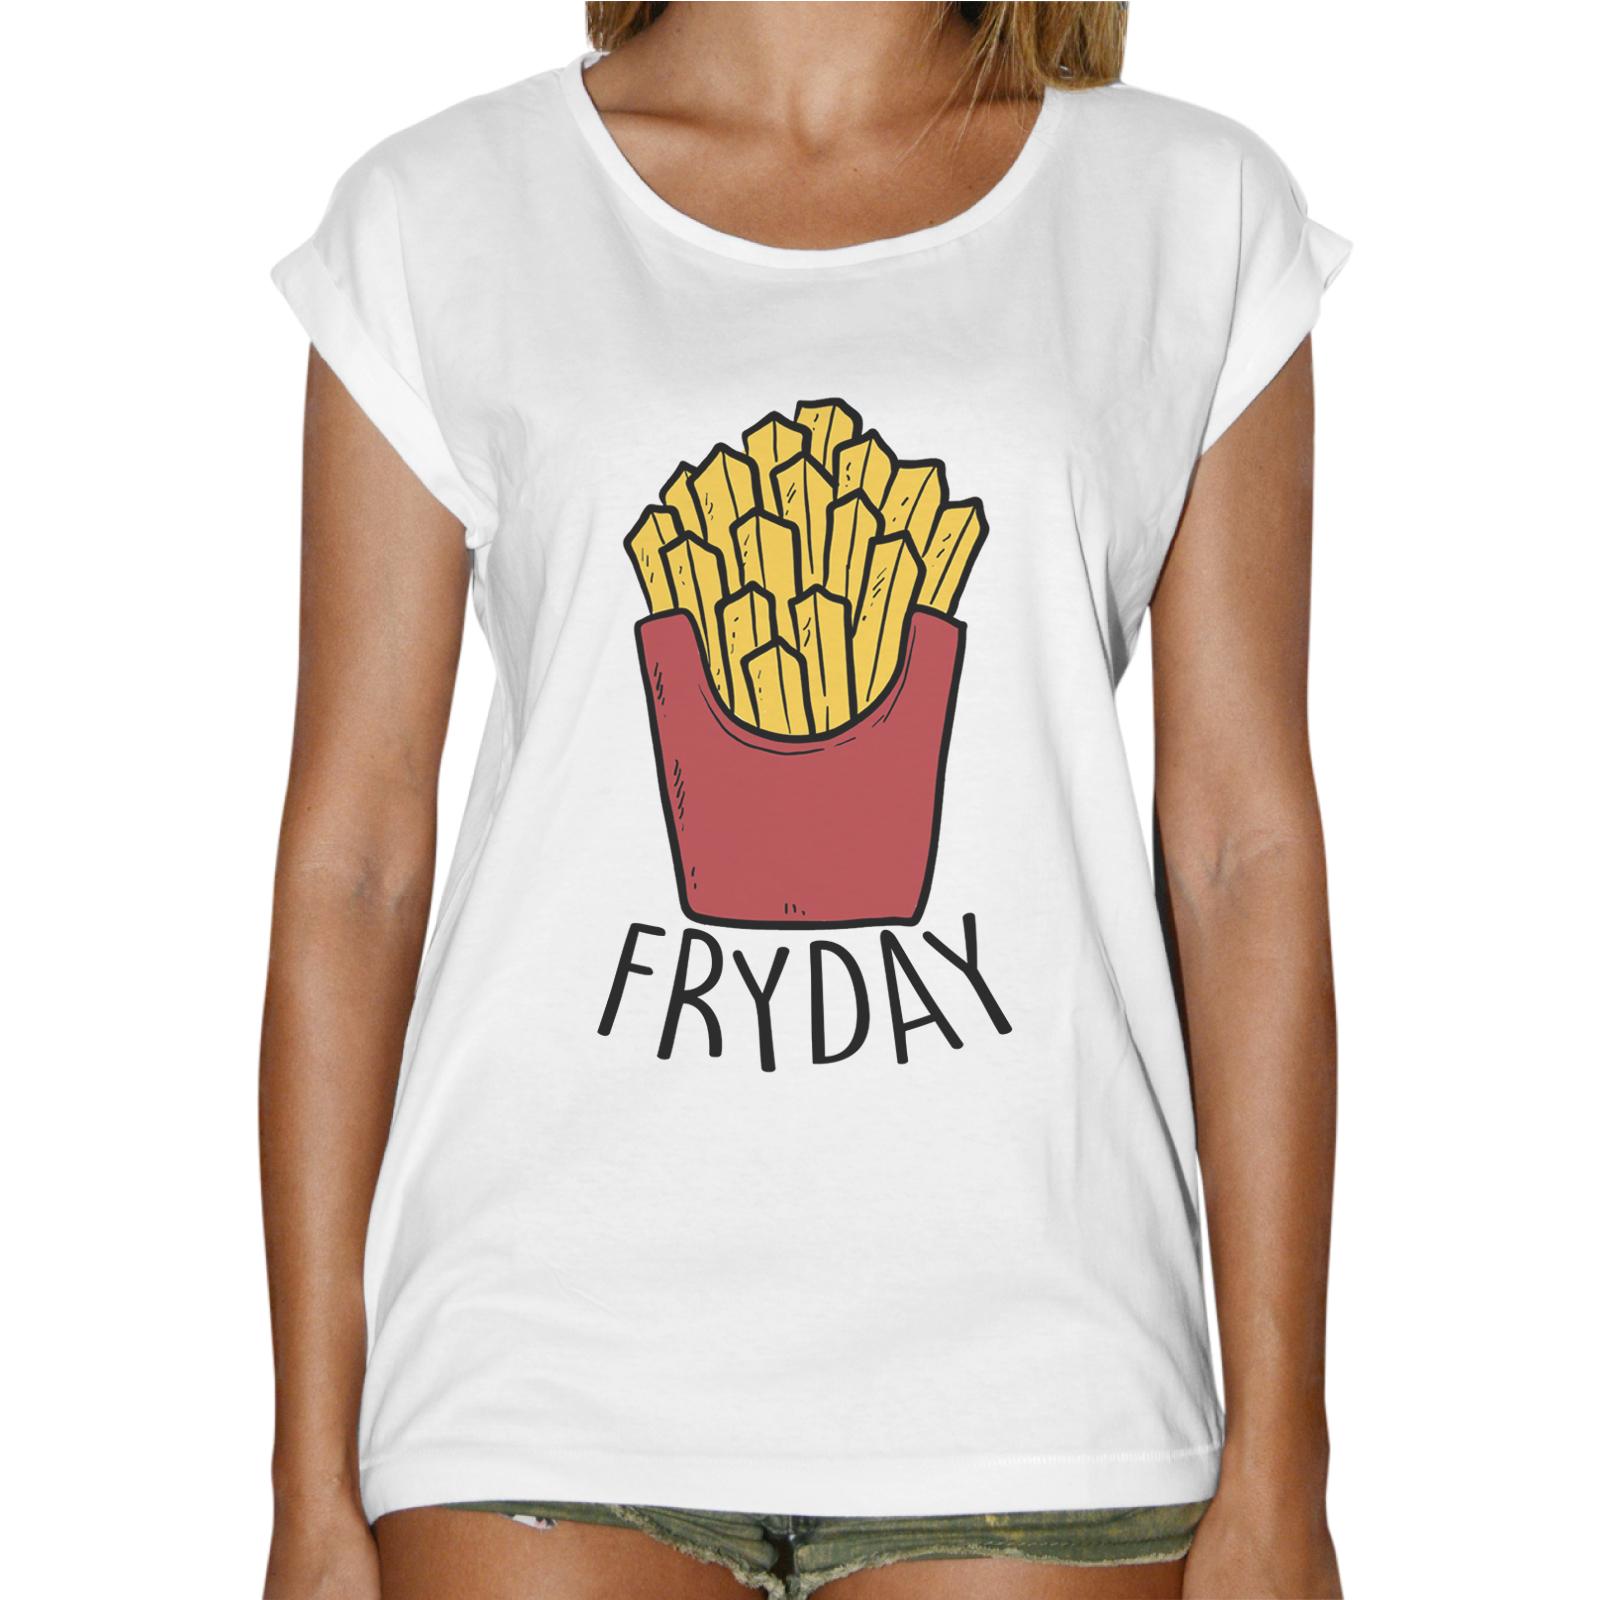 T-Shirt Donna Fashion FRYDAY